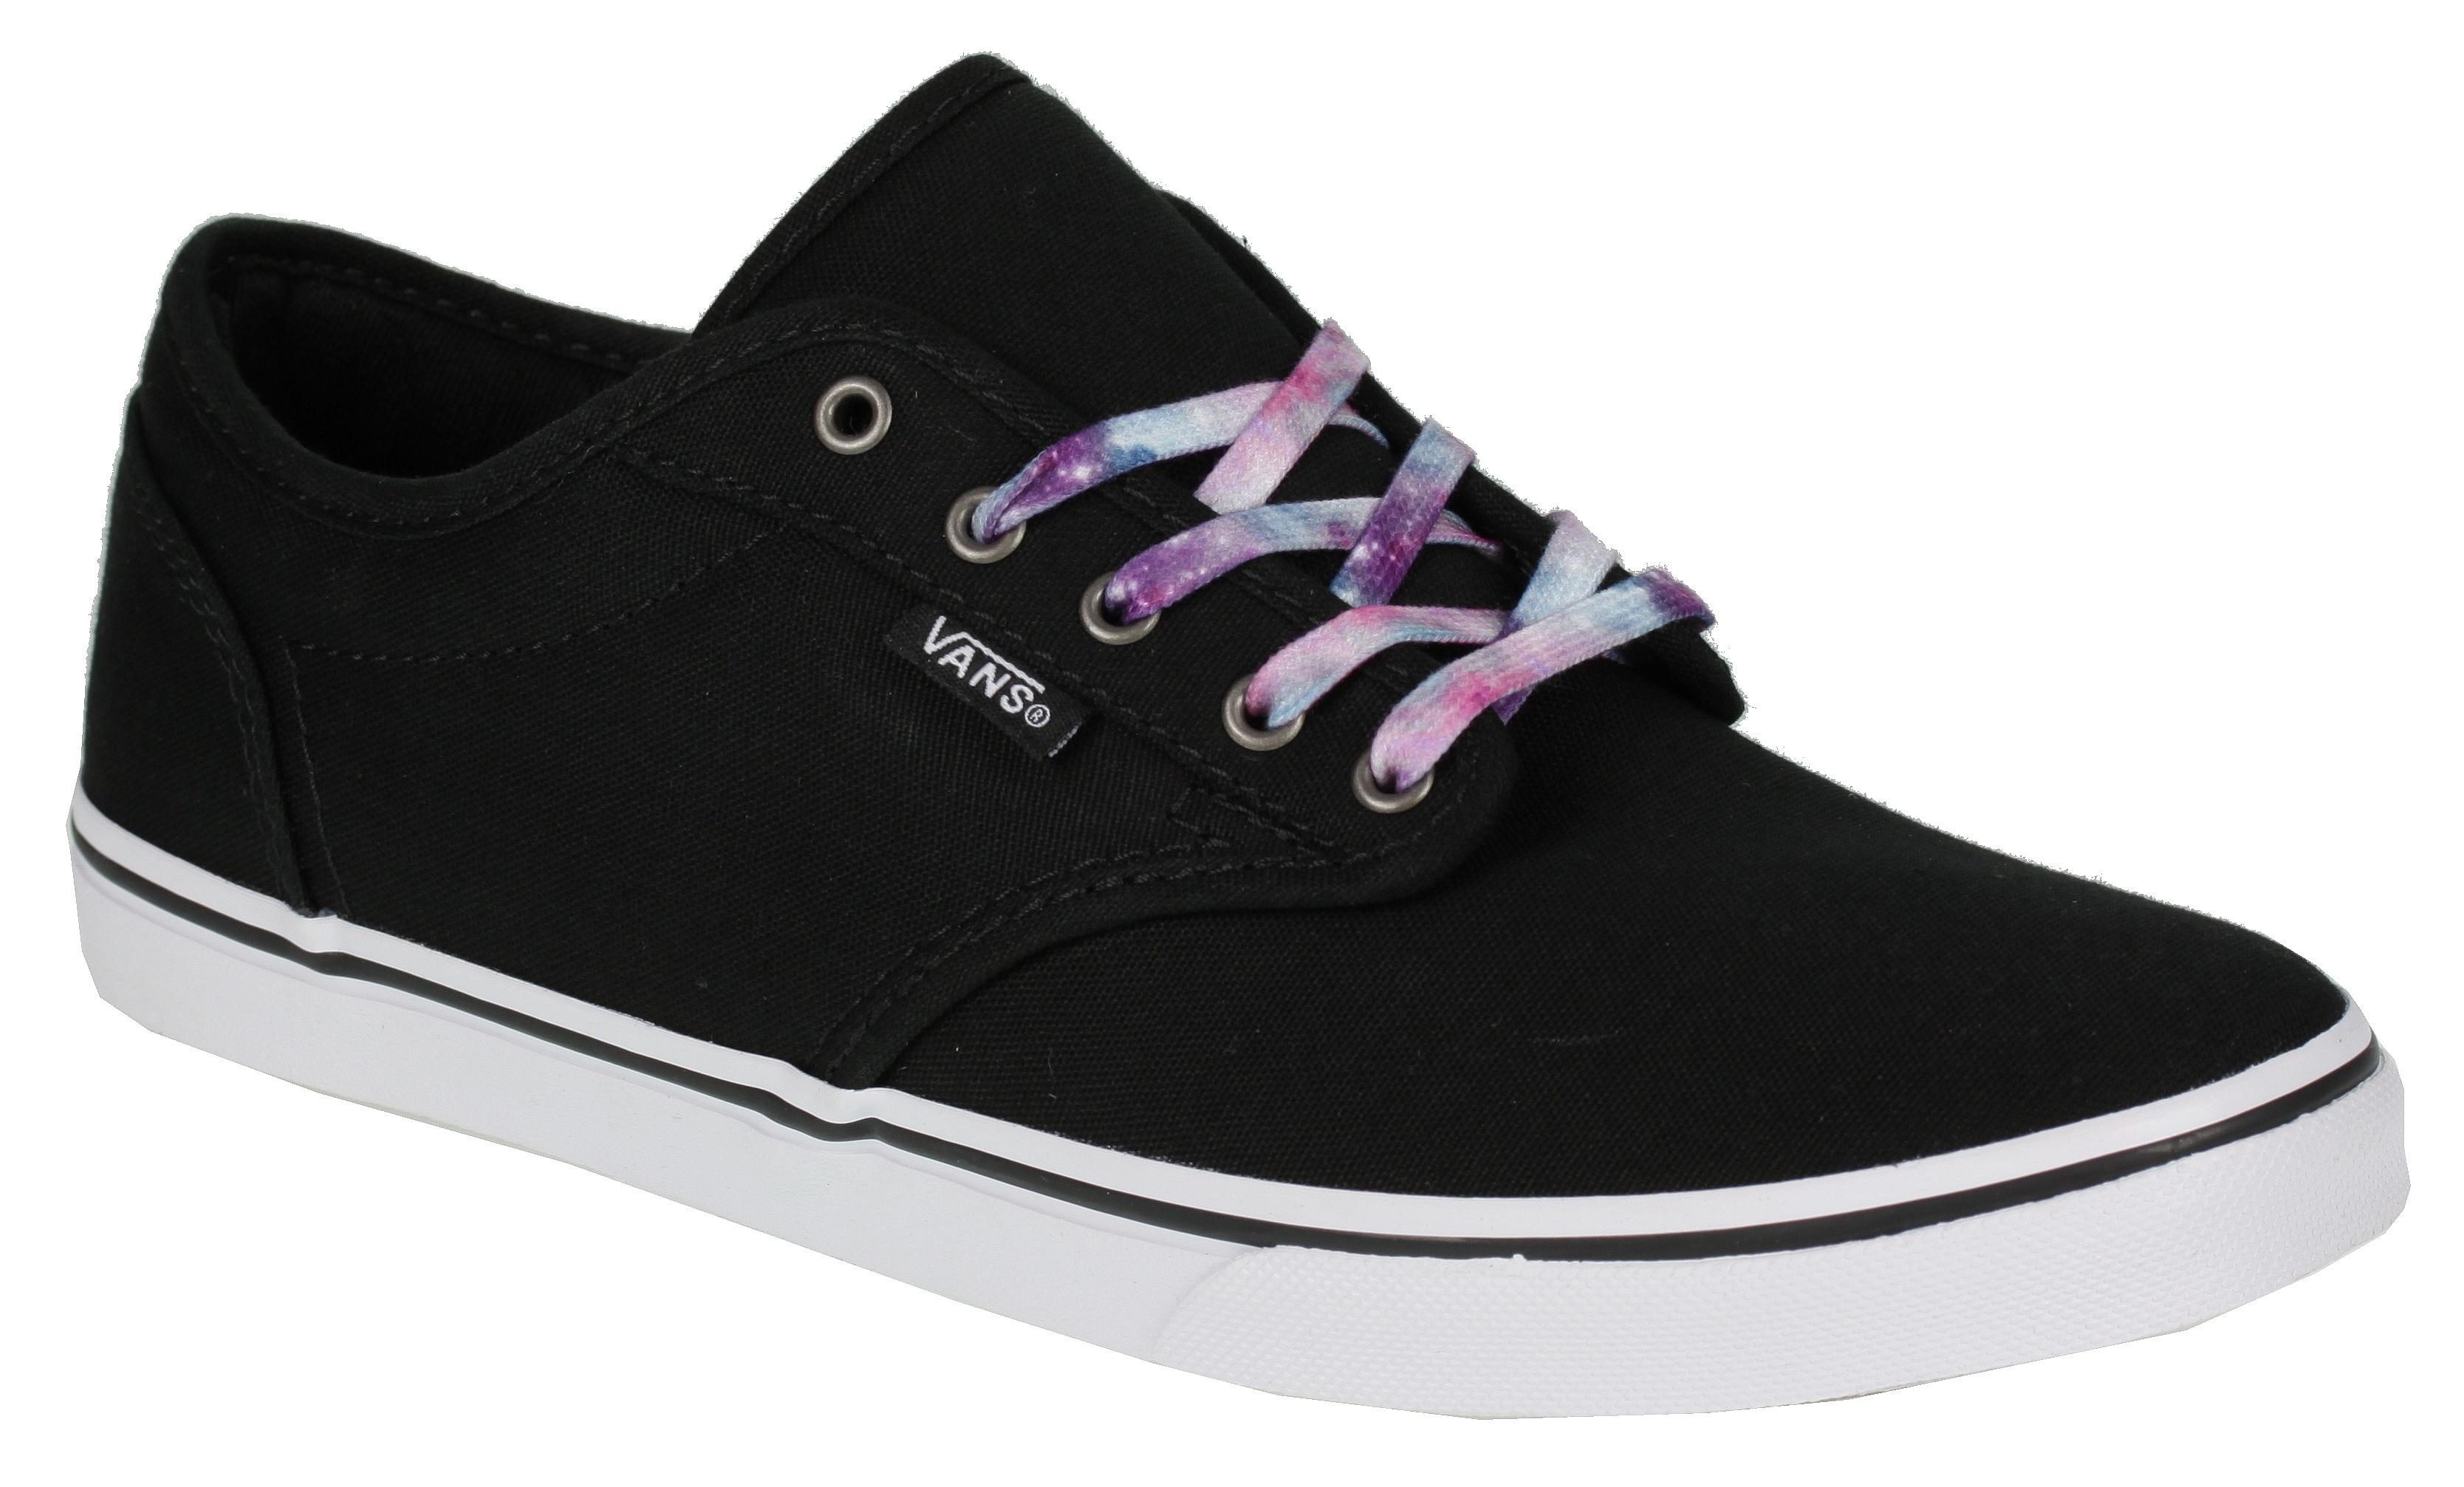 84394af57 topánky Vans Atwood Low - Cosmic Galaxy Lace/Black - Snowboard shop,  skateshop - snowboard-online.sk